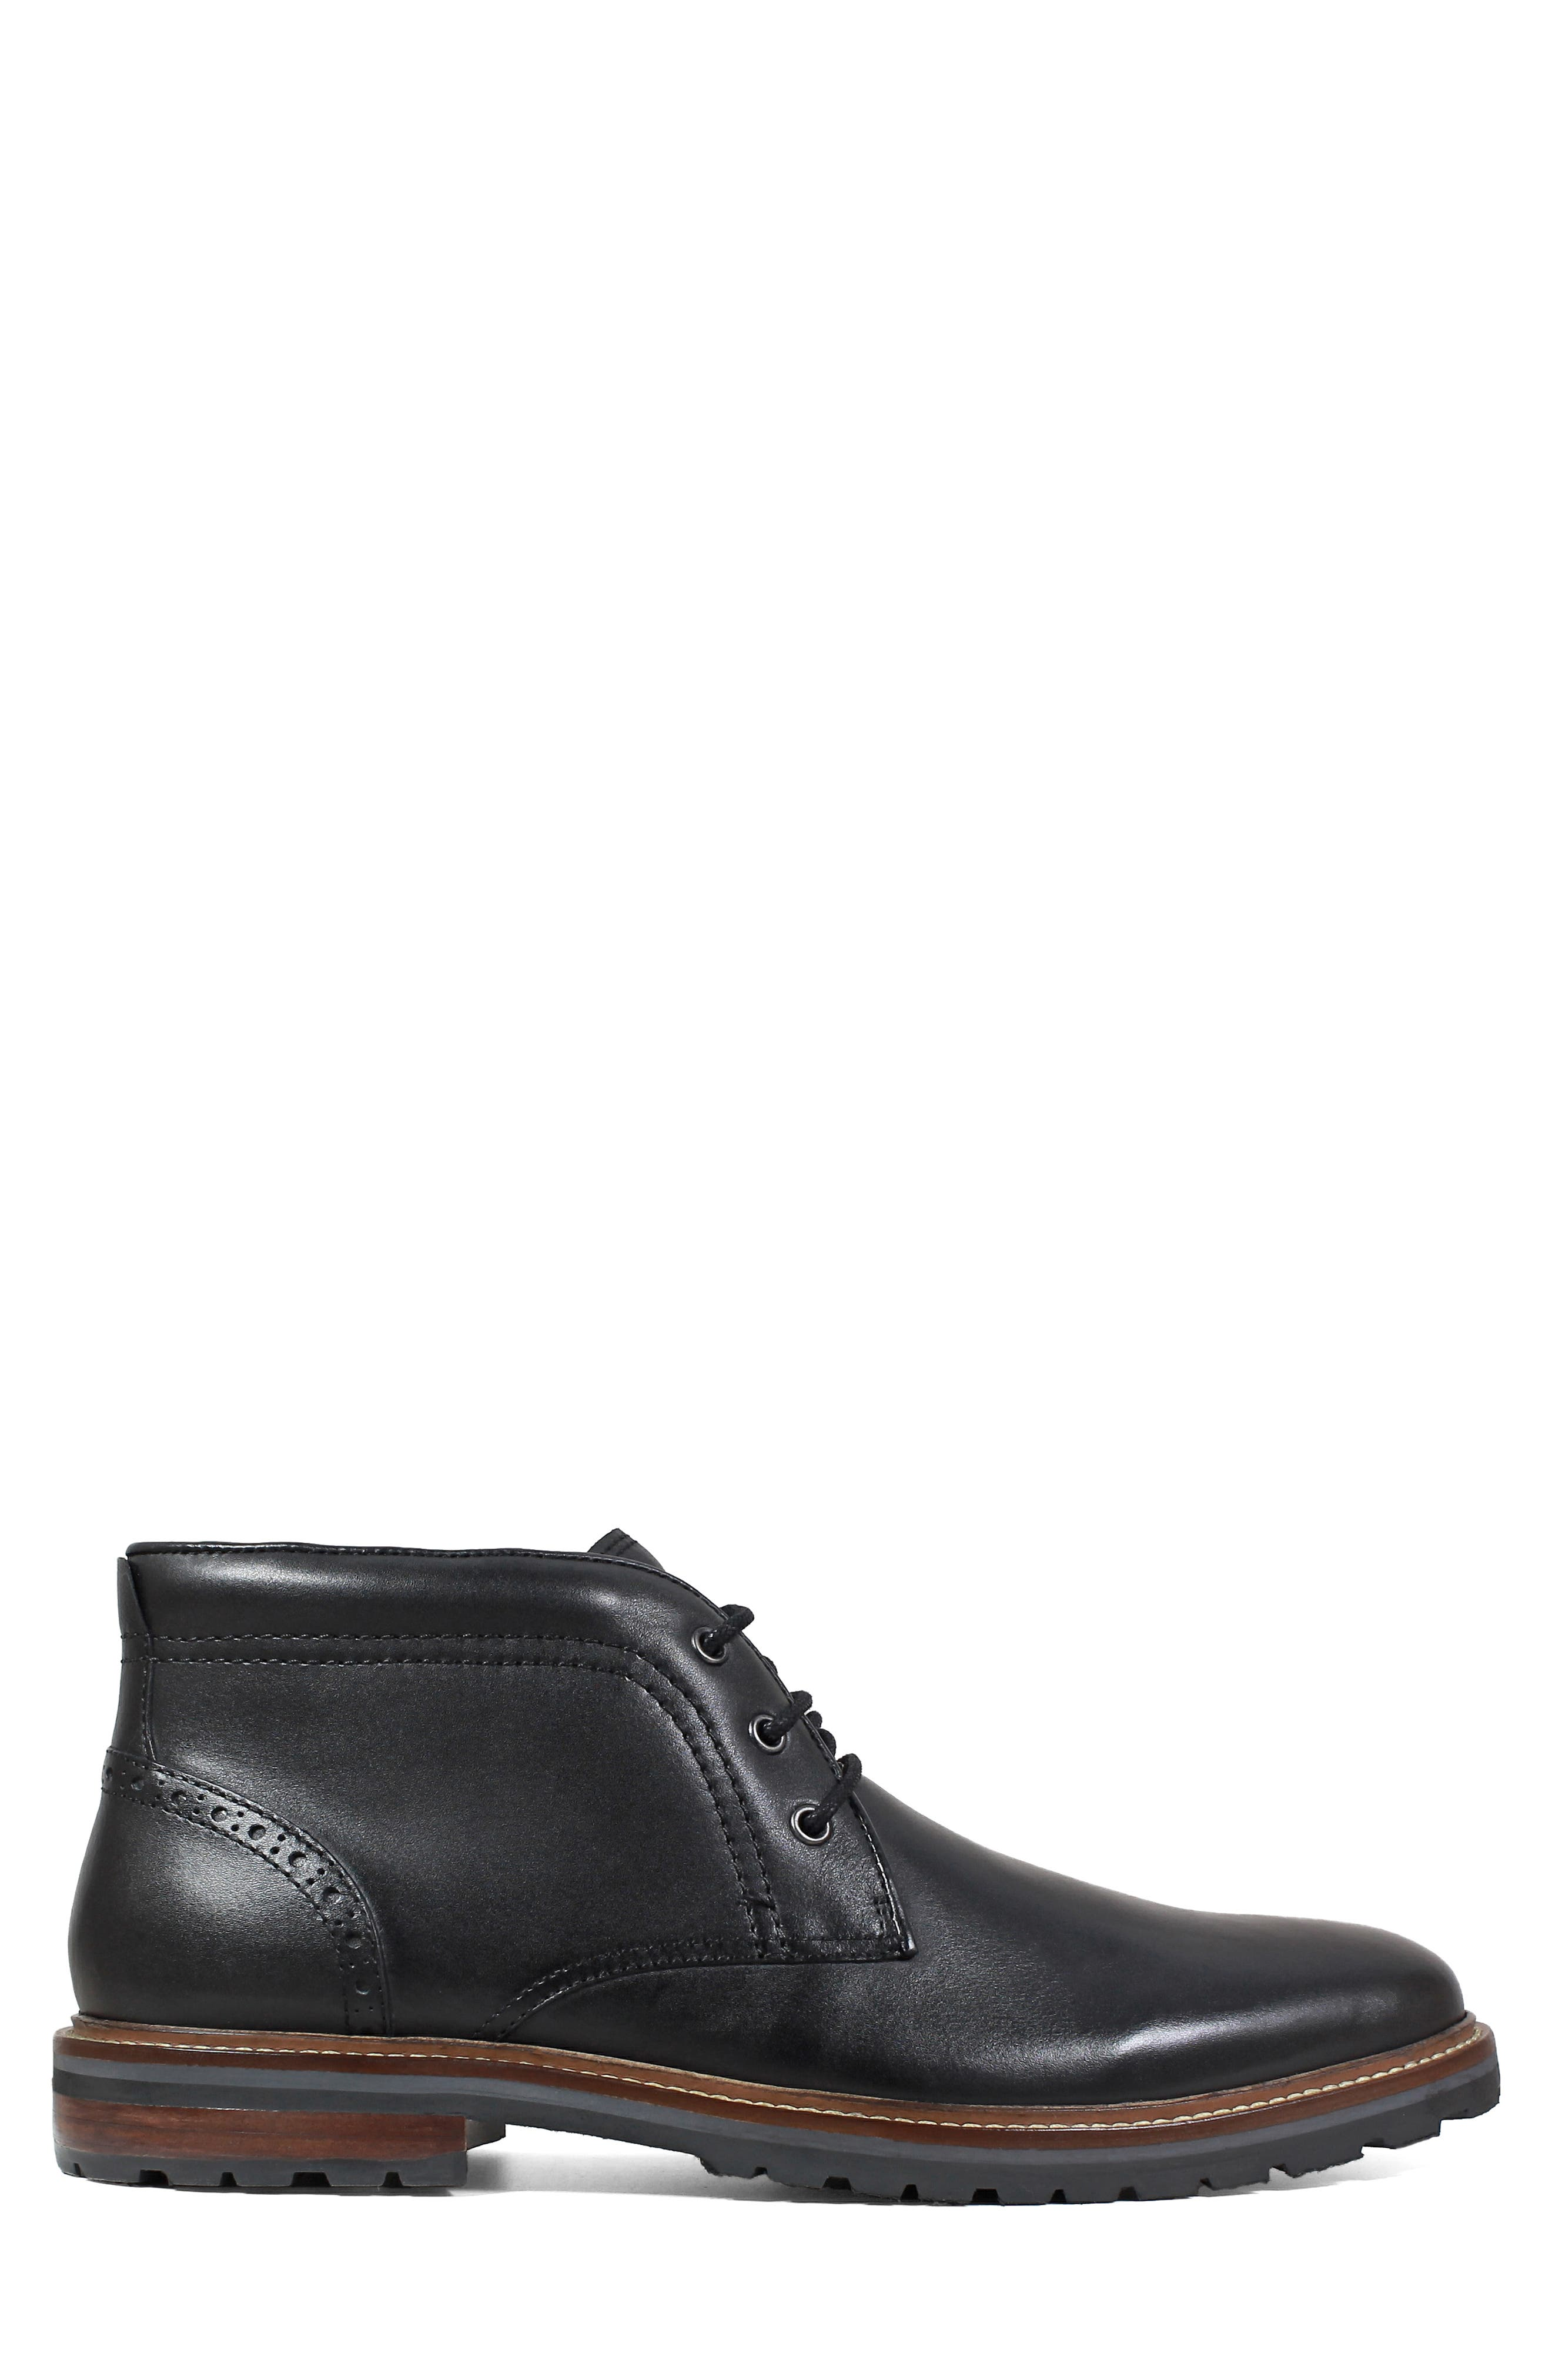 FLORSHEIM, Estabrook Lugged Chukka Boot, Alternate thumbnail 3, color, BLACK LEATHER